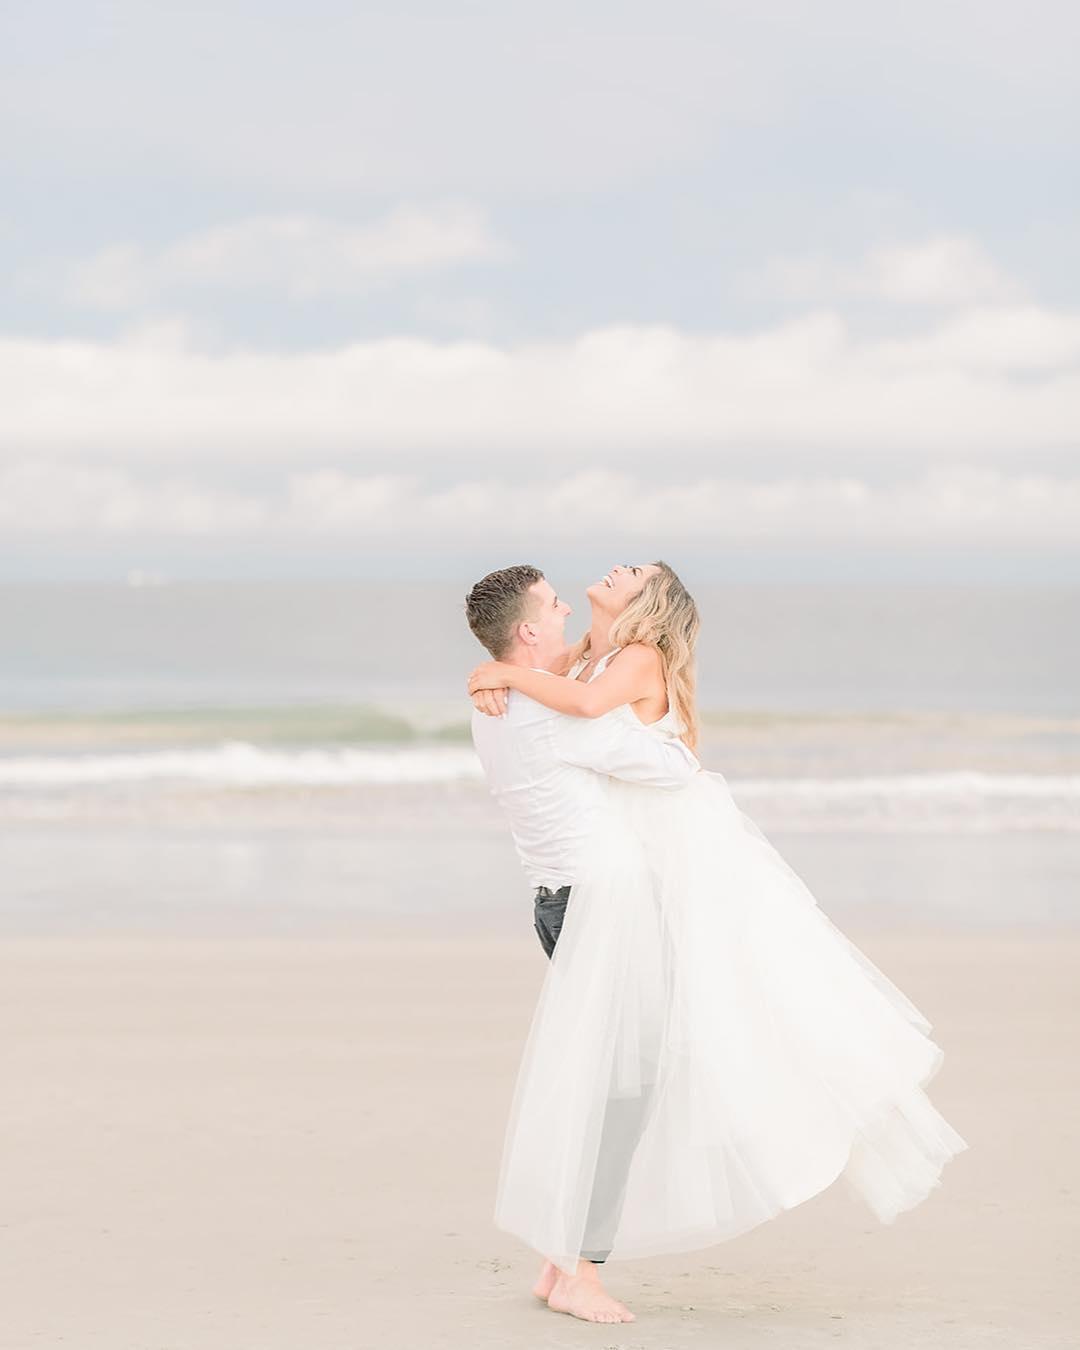 bredice_beauty_hair_makeup_brides_grooms_destination_weddings_hiltonhead_carolina_.jpg